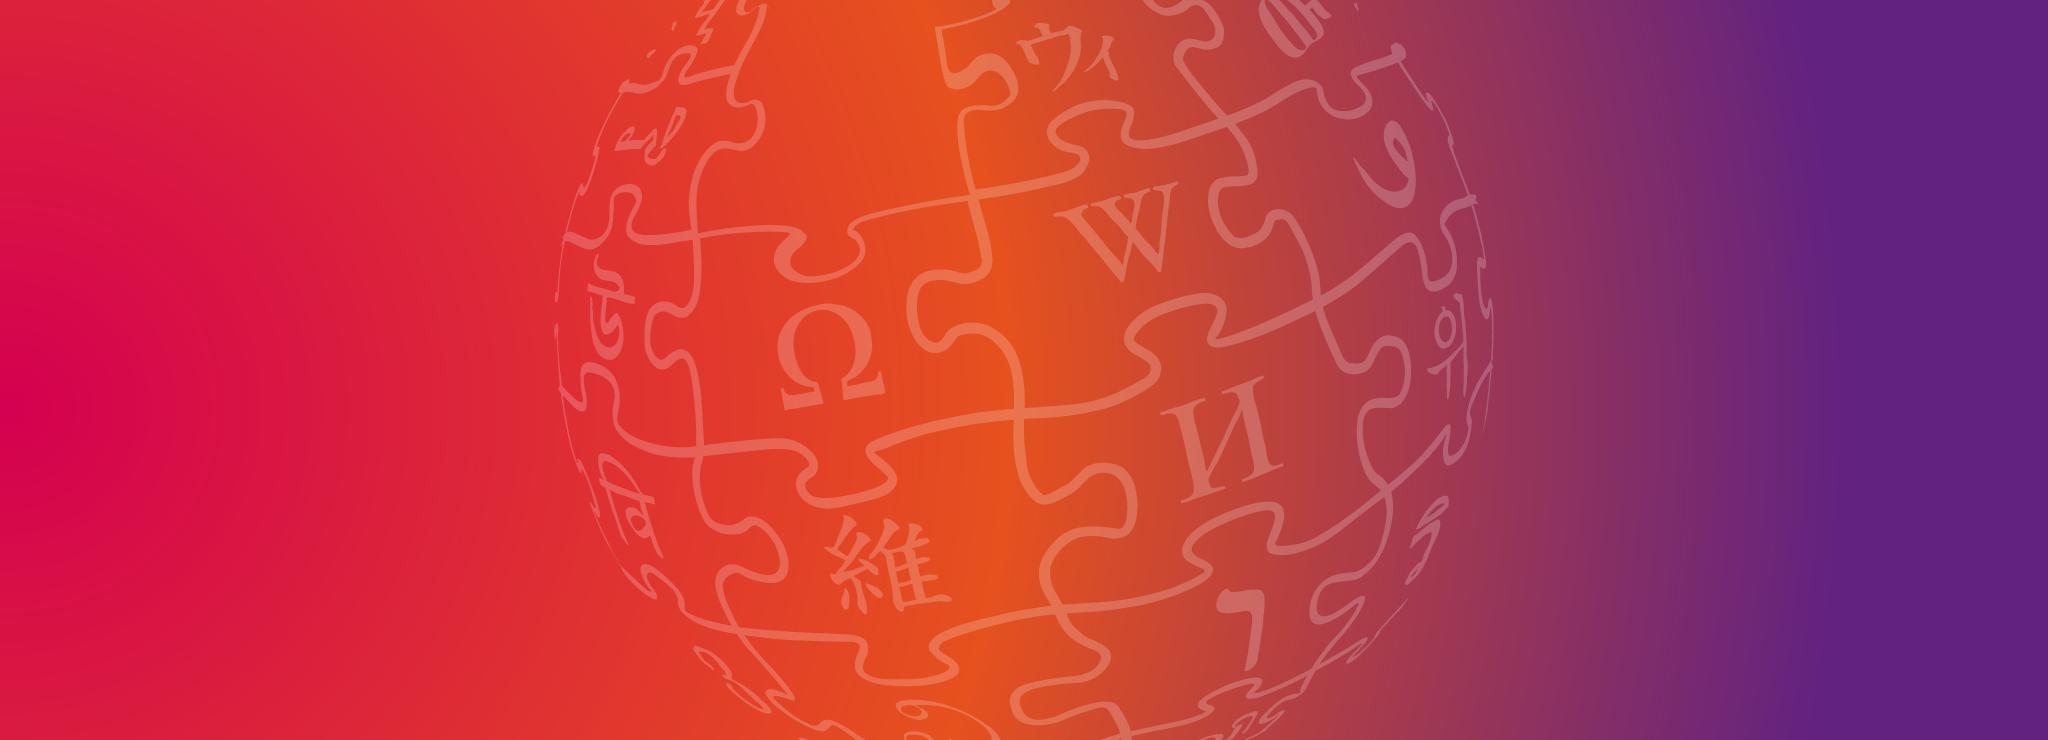 https://medialab.usal.es/wp-content/uploads/2016/05/Imagen-cabecera-wiki-party.png